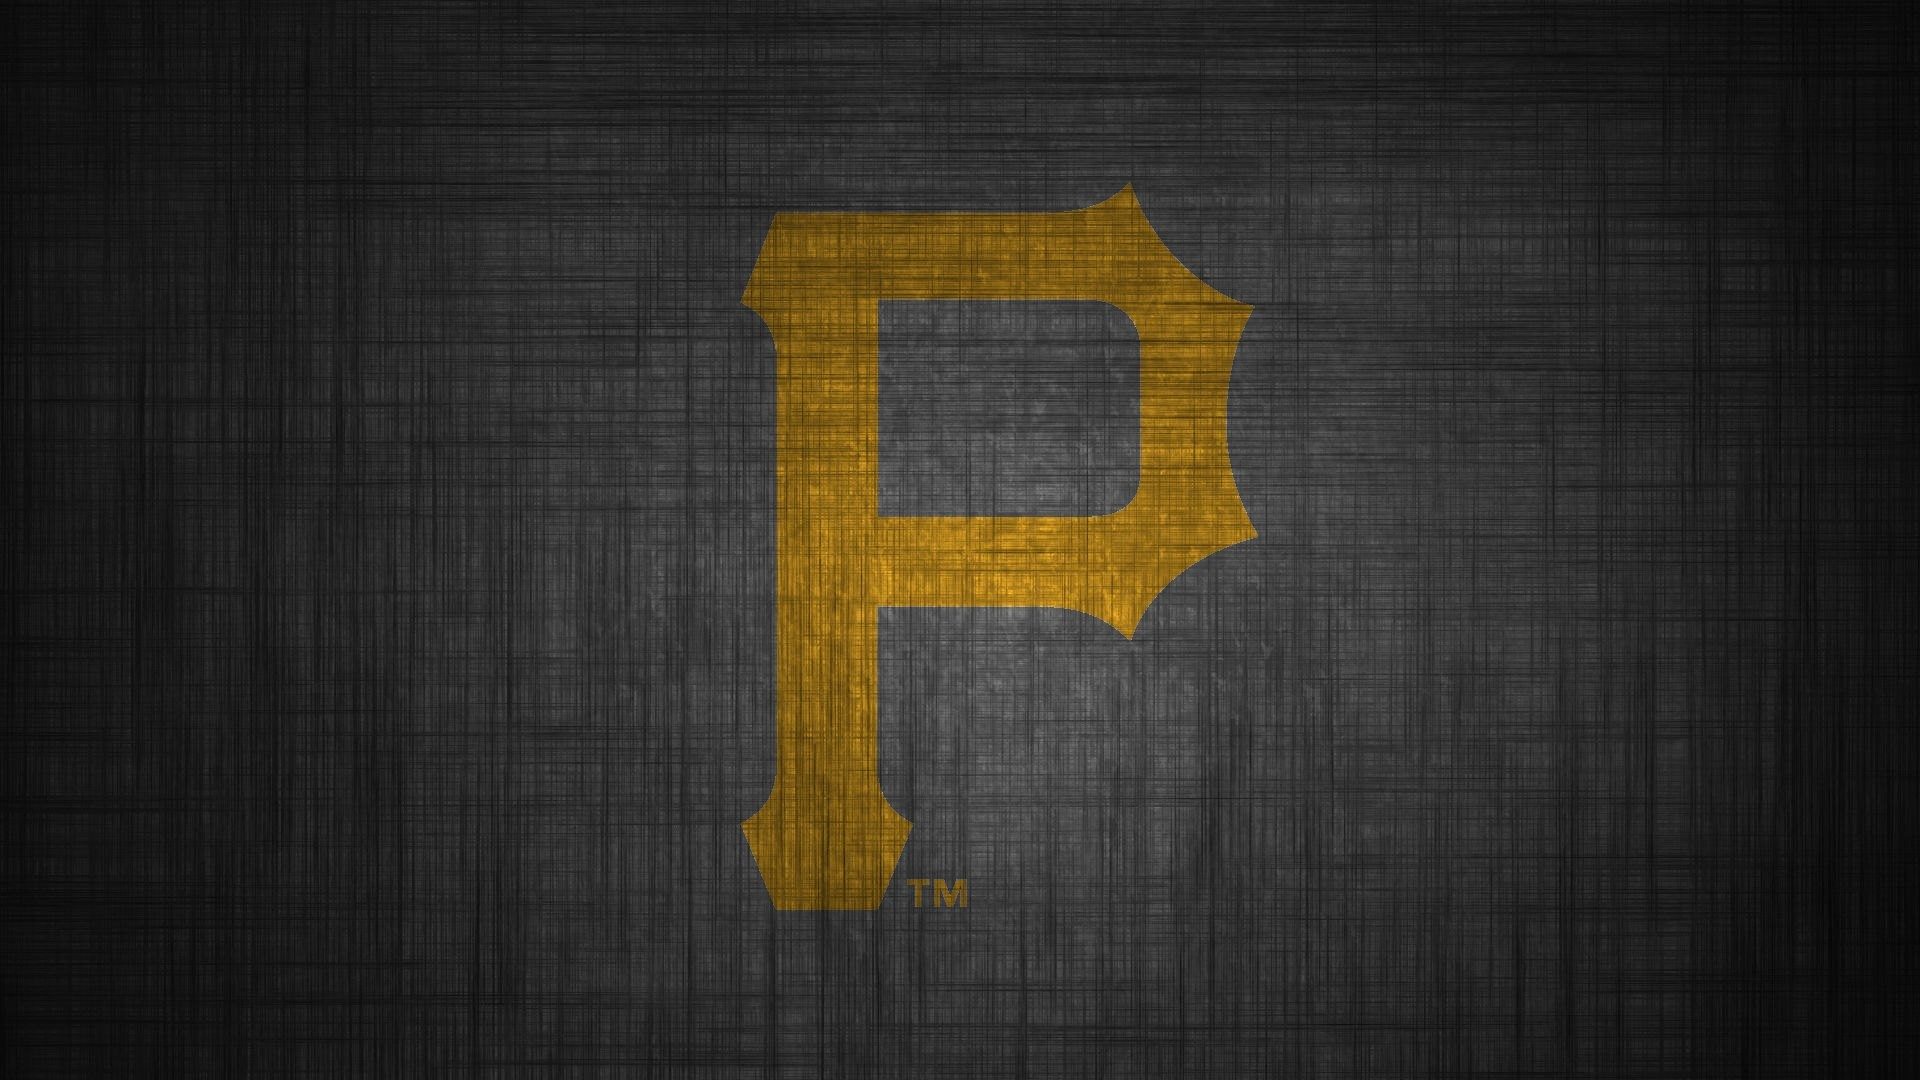 pittsburgh pirates mobile wallpaper  50 images pittsburgh pirates logo image printable Pittsburgh Pirates Logo Wallpaper